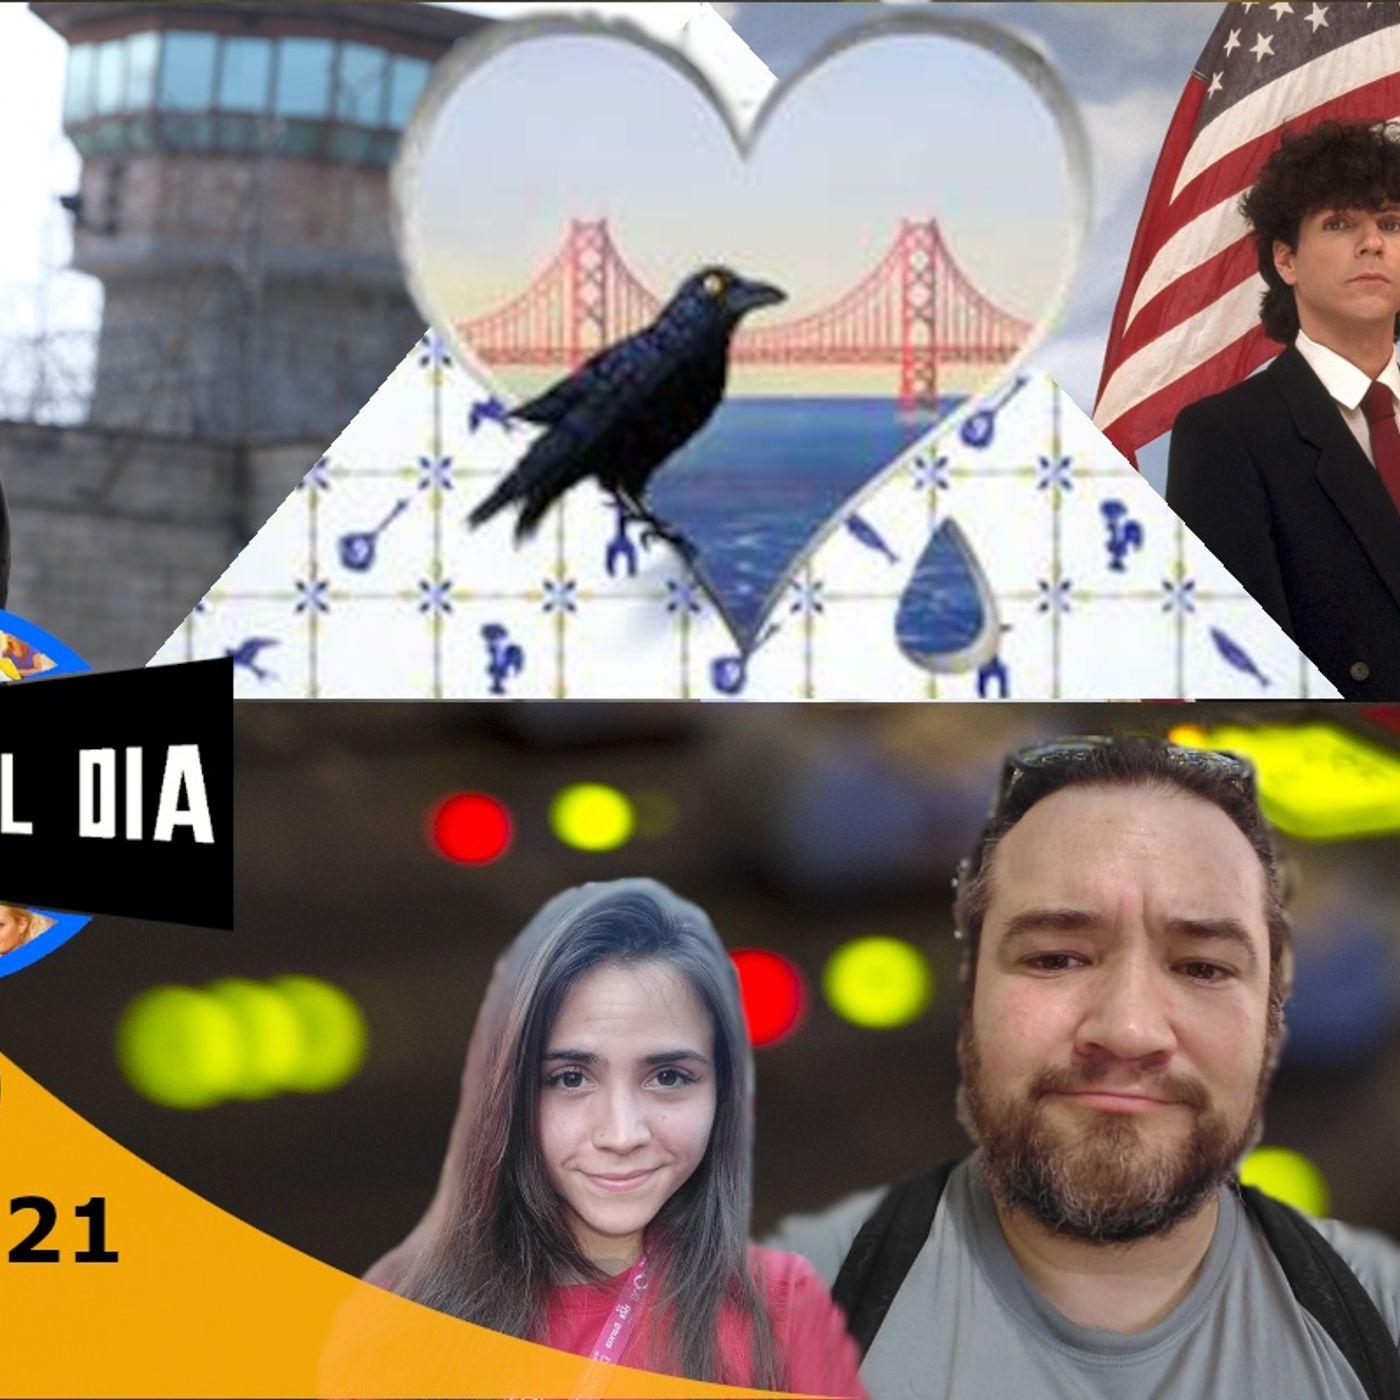 Maixabel | Got Talent | Ponte al día 499 (24/09/21)